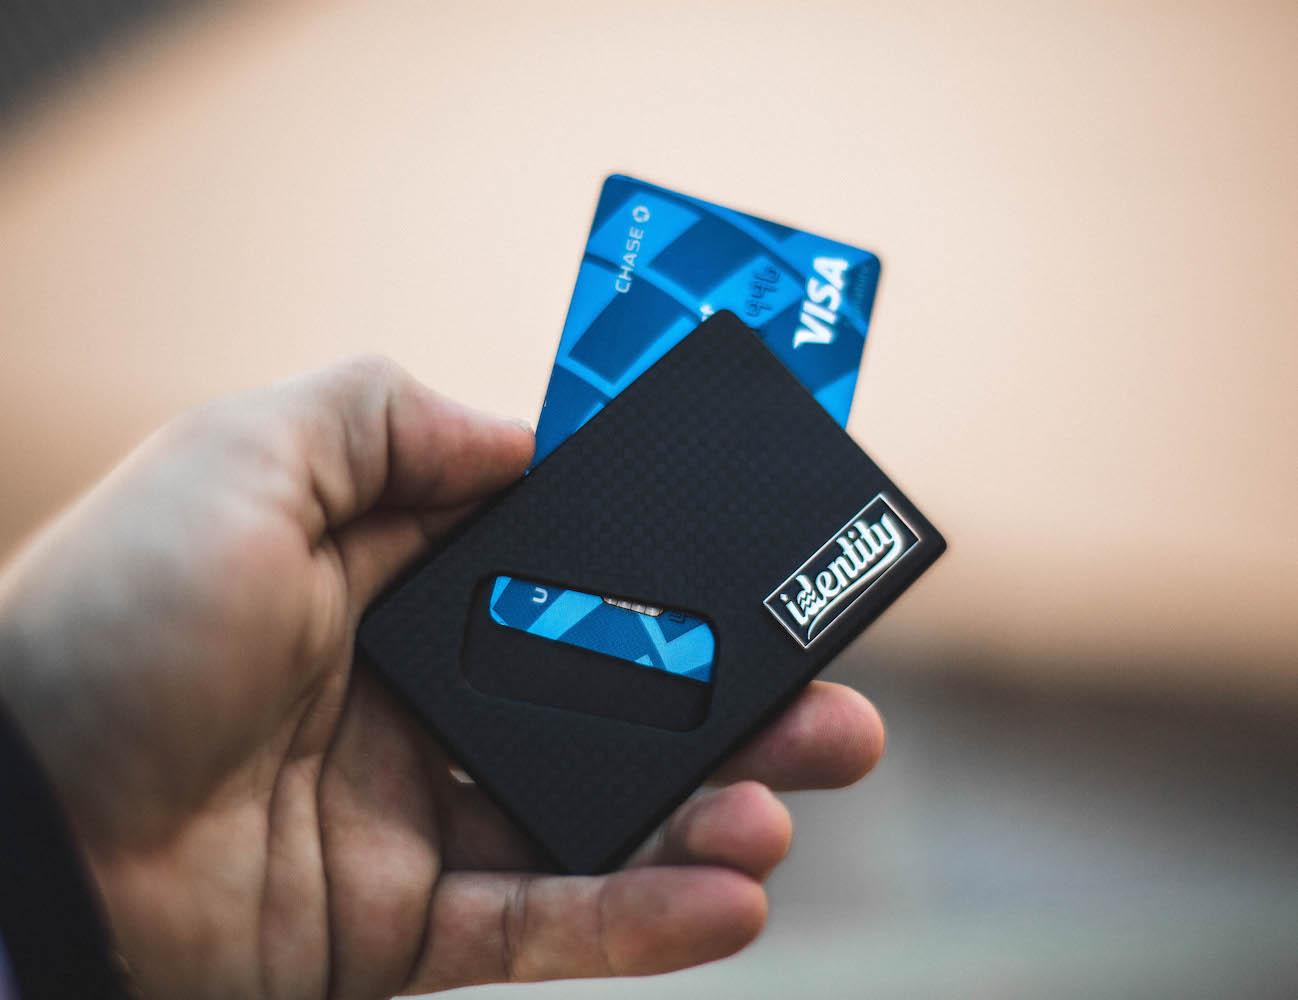 identity-card-wallet-01